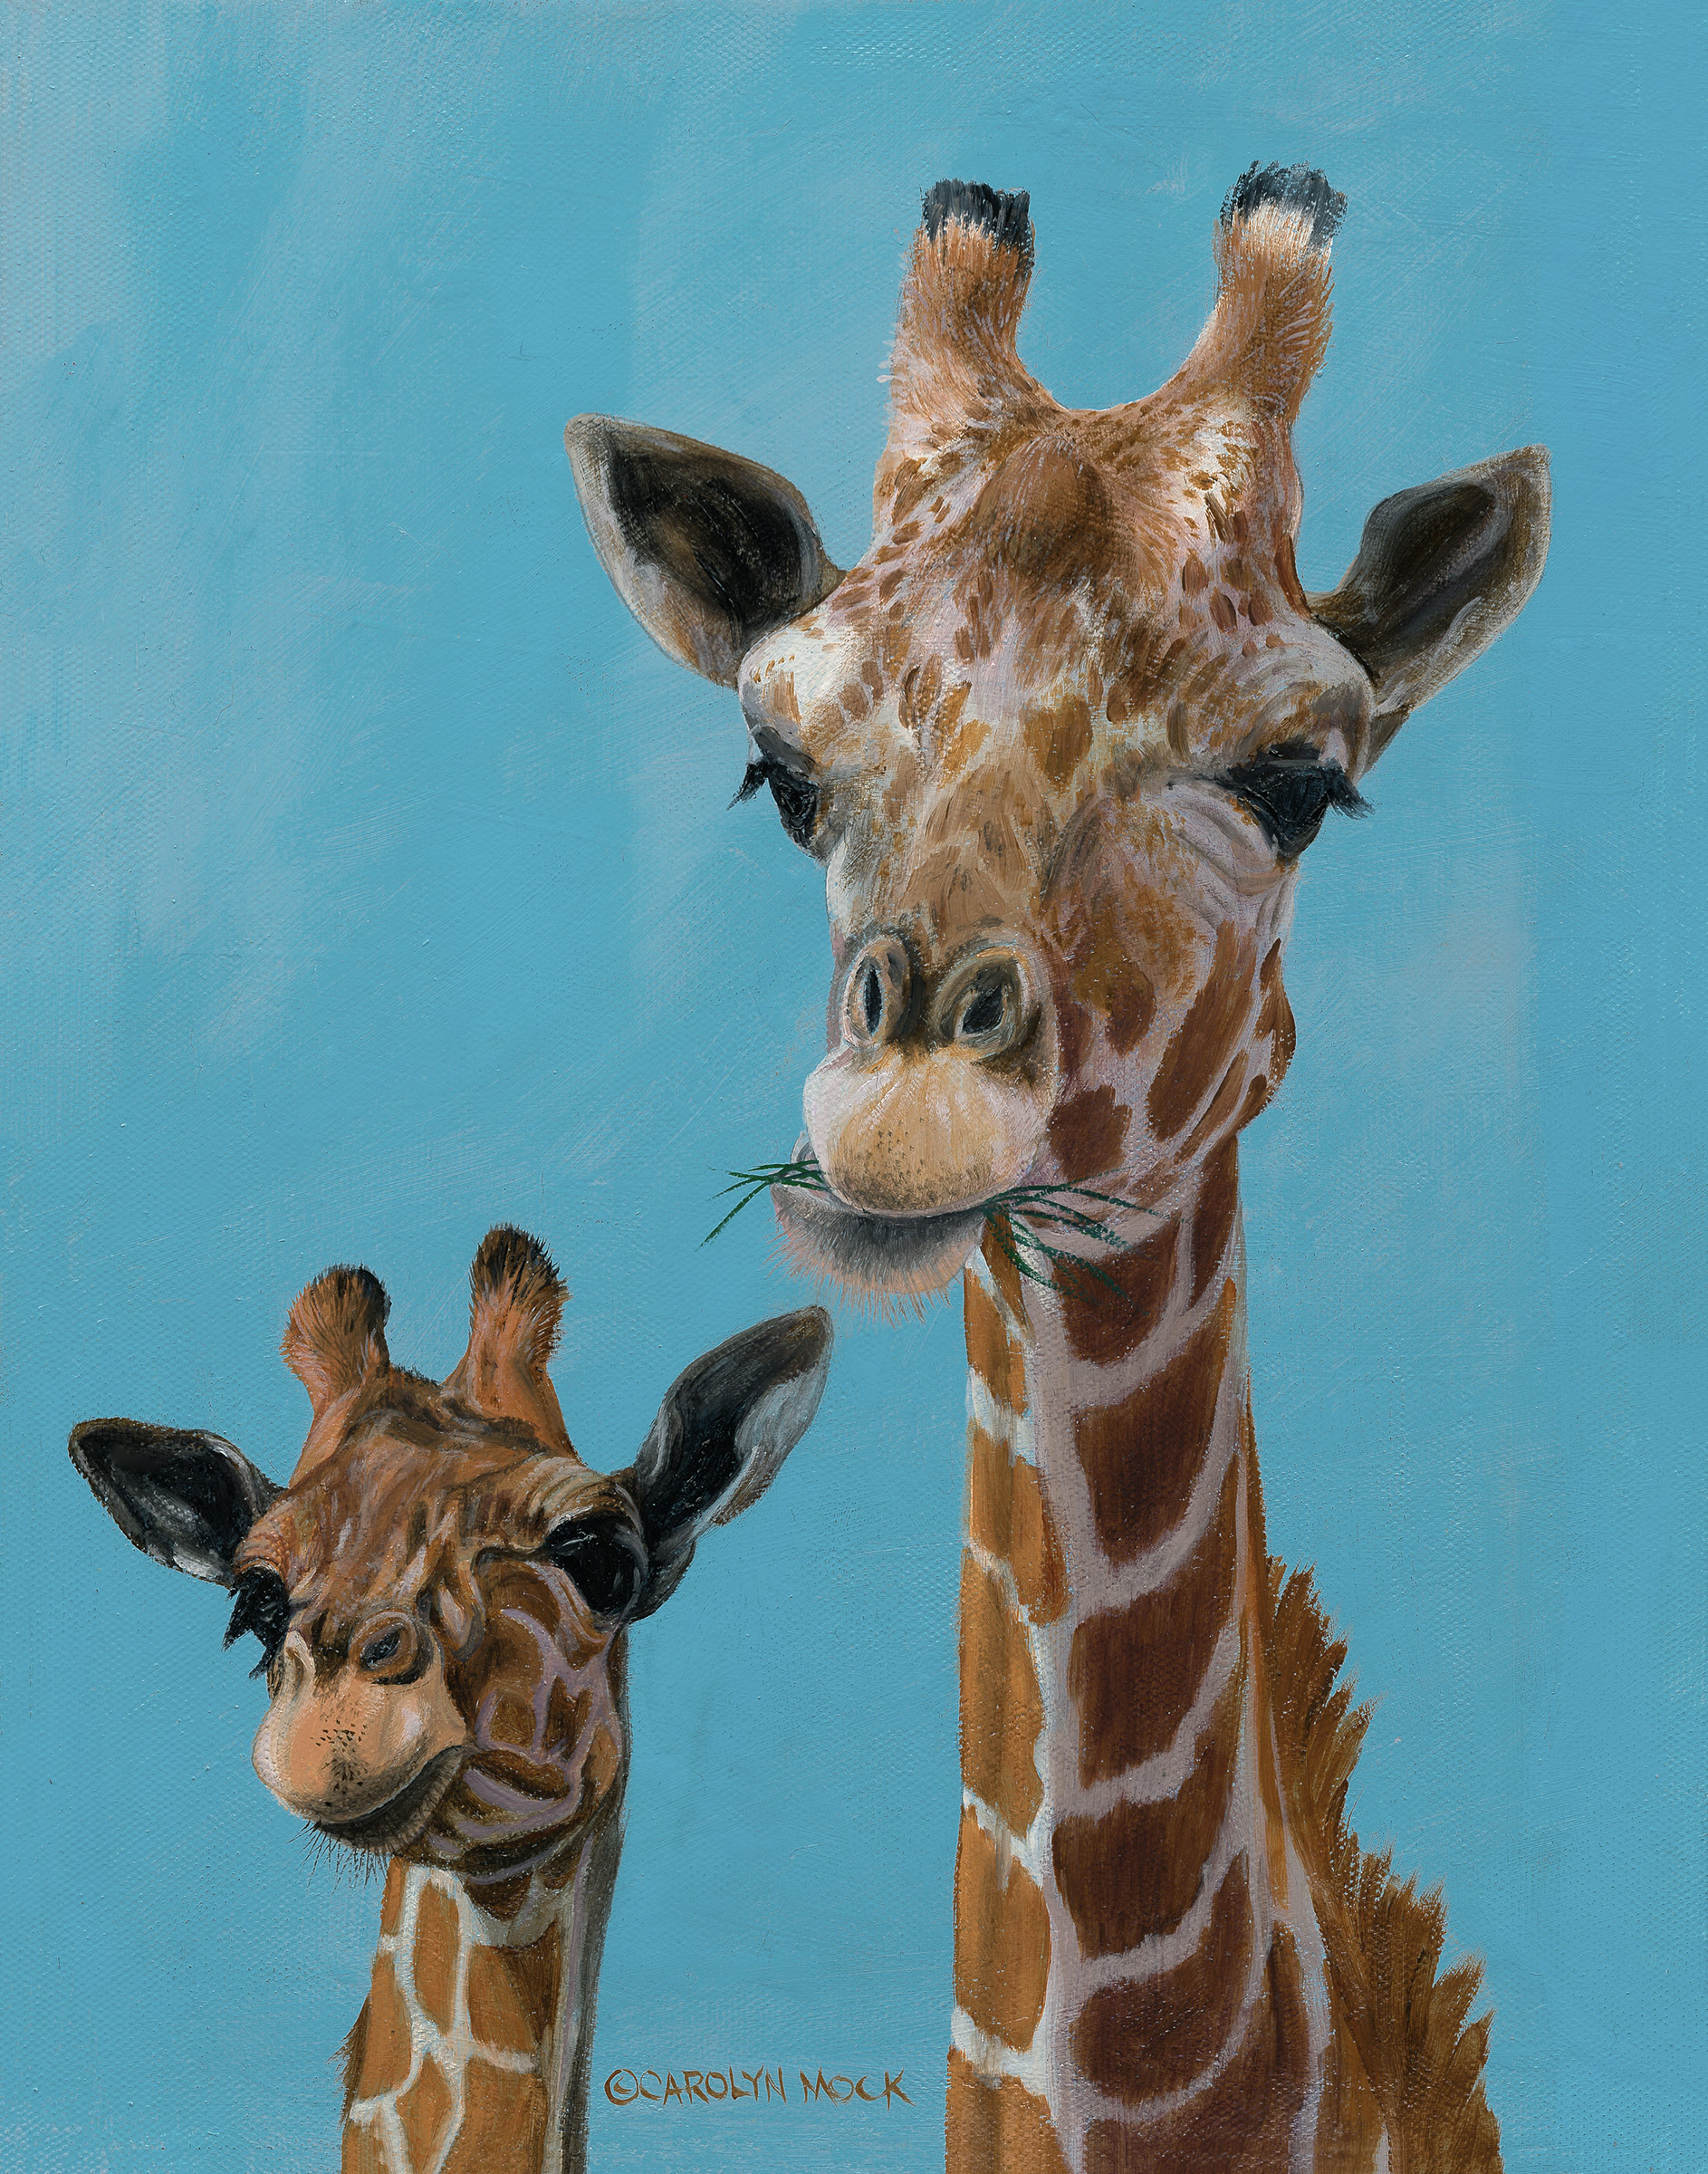 Two giraffes enjoy some greens